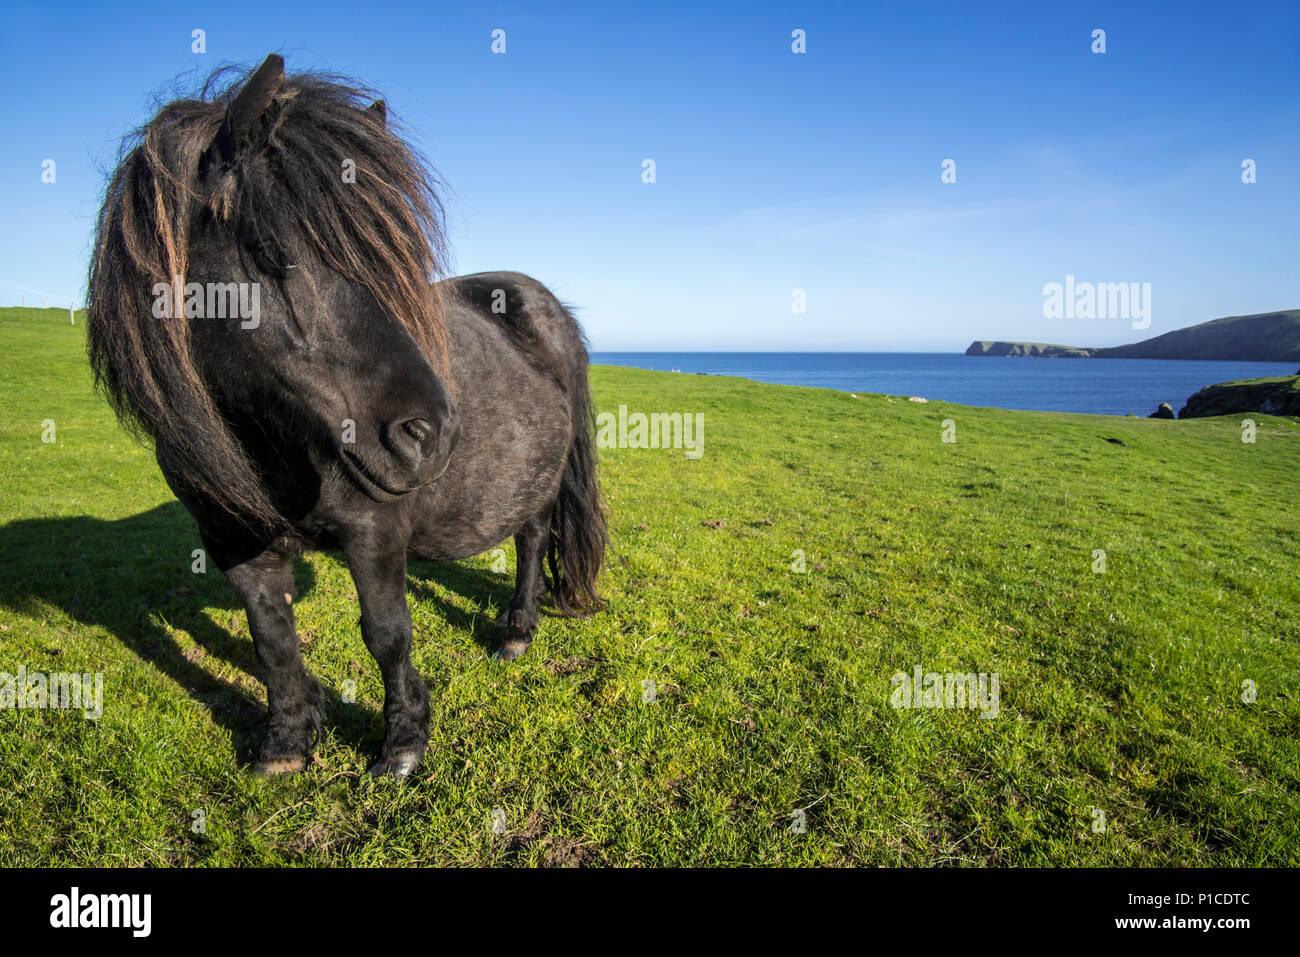 Black Shetland pony in field along the coast on the Shetland Islands, Scotland, UK - Stock Image